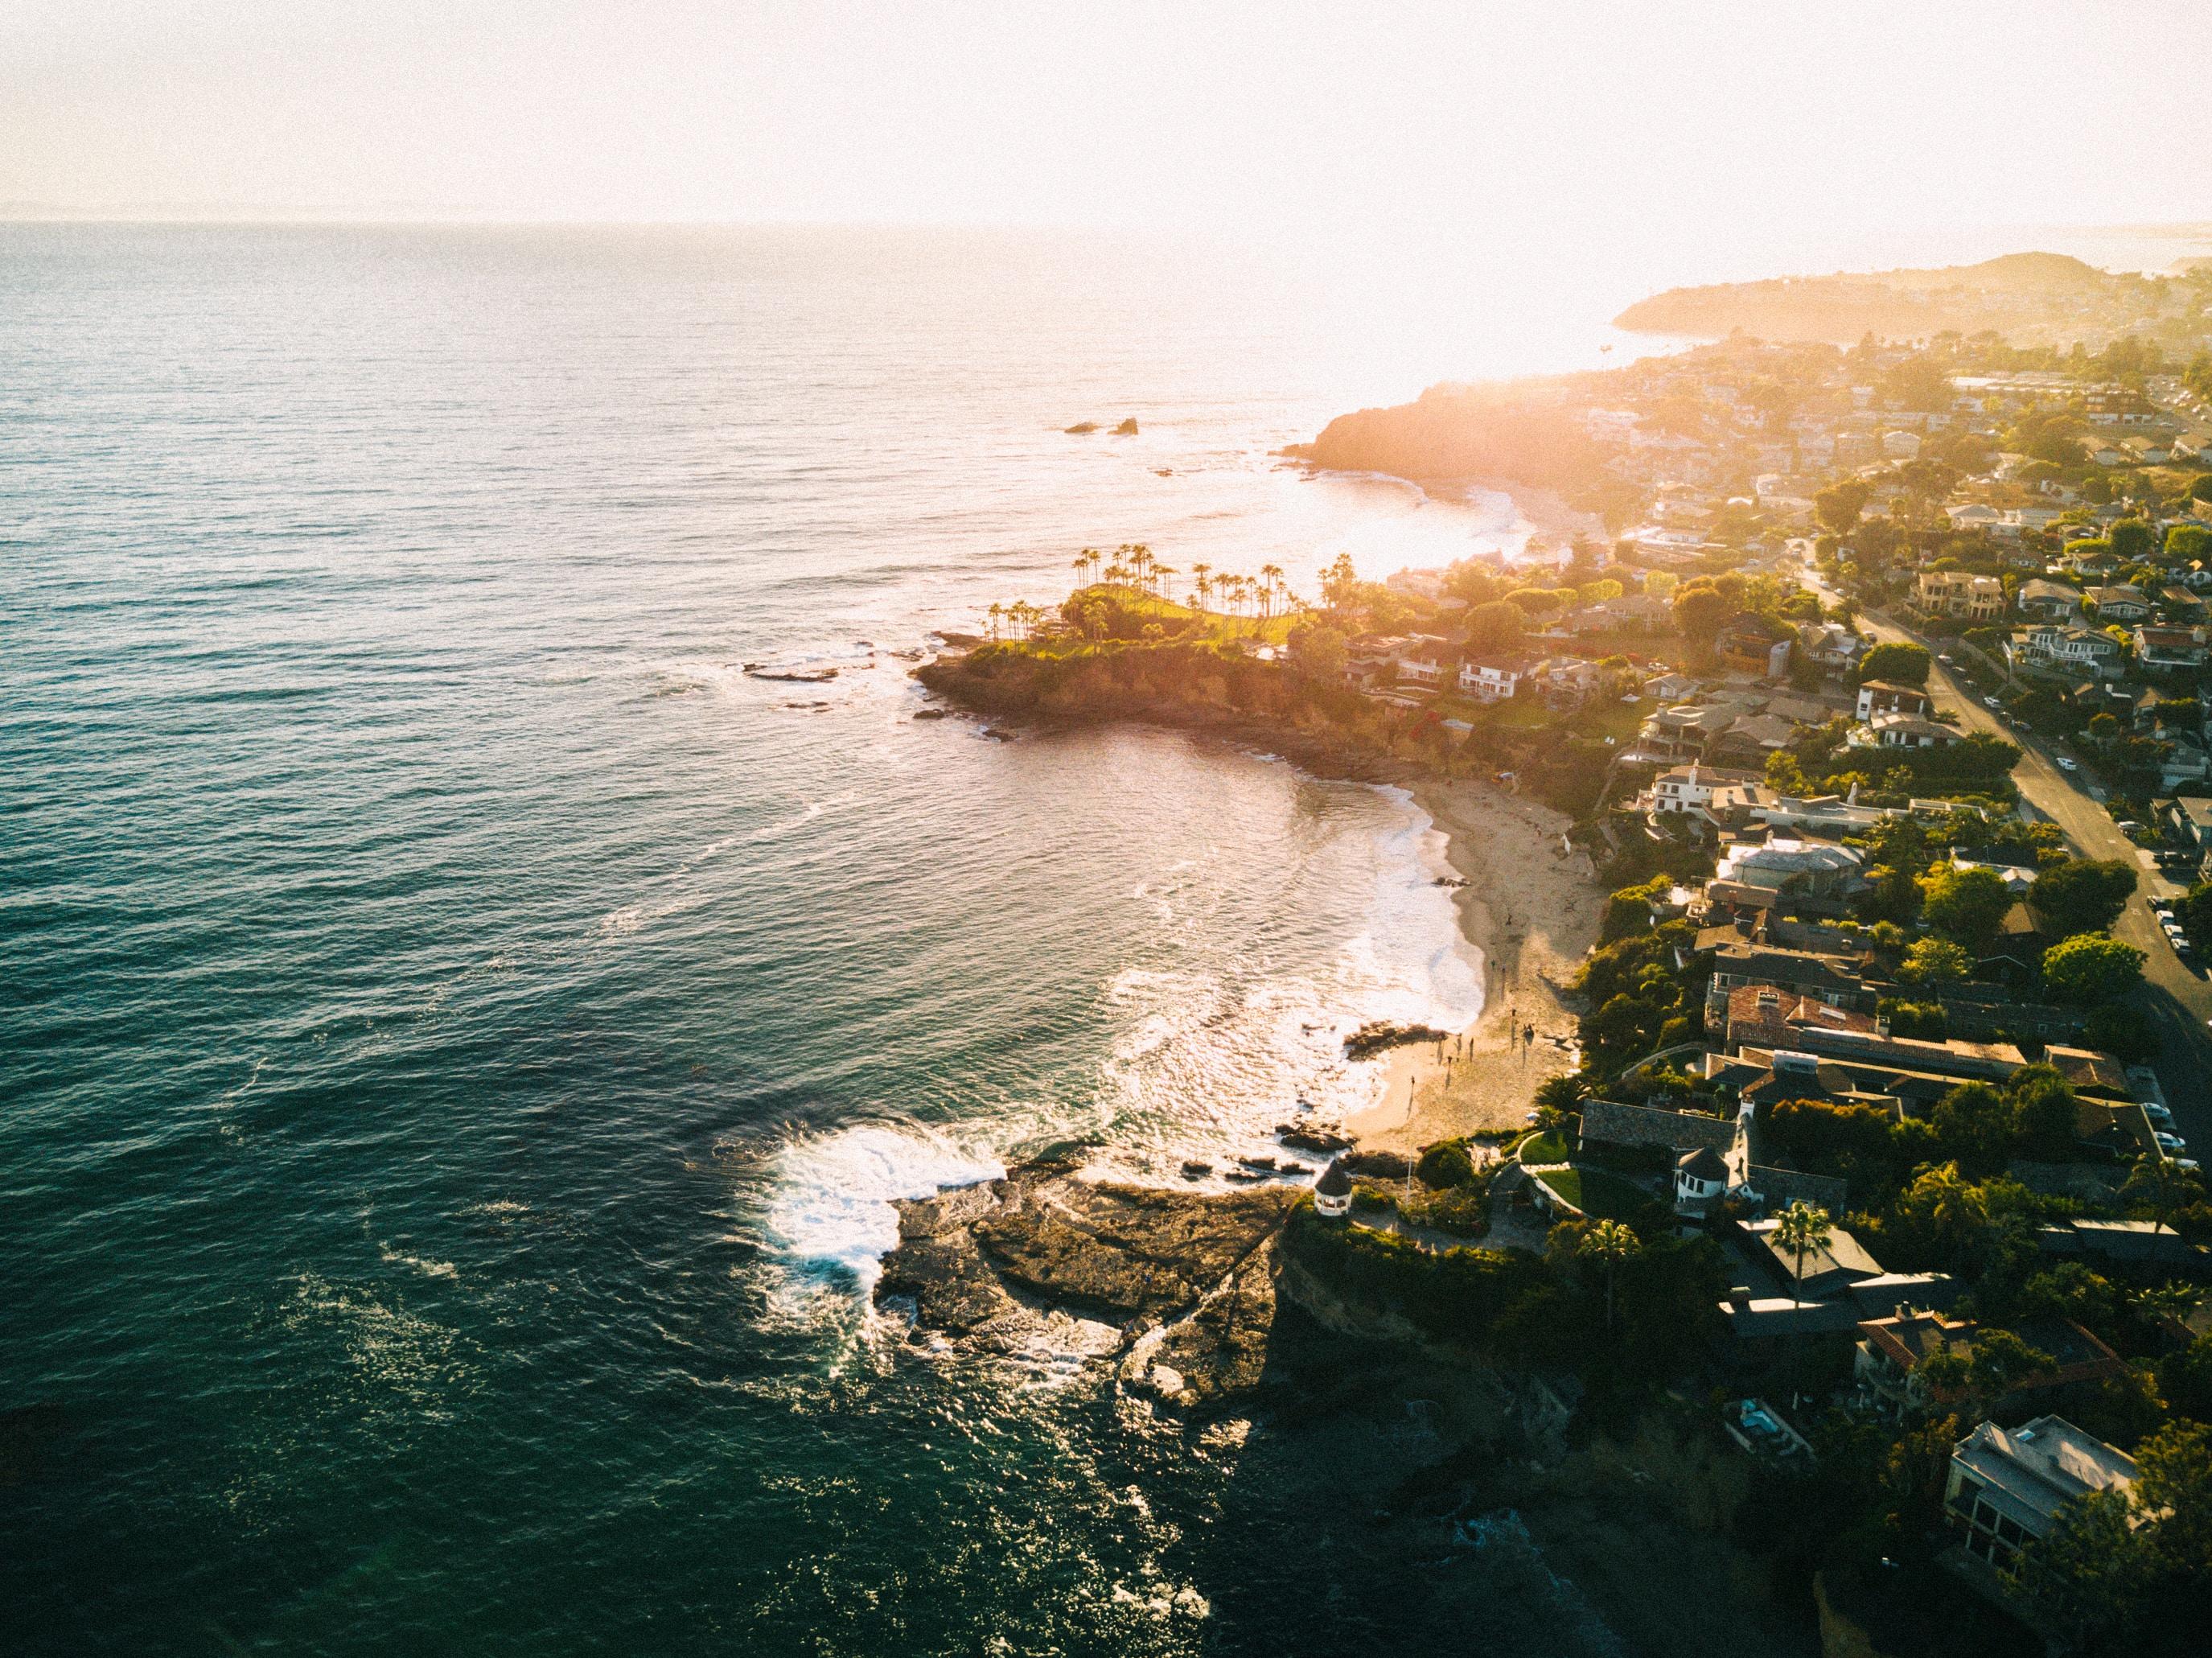 Drone aerial view of the urban Laguna Beach coastline at sunset